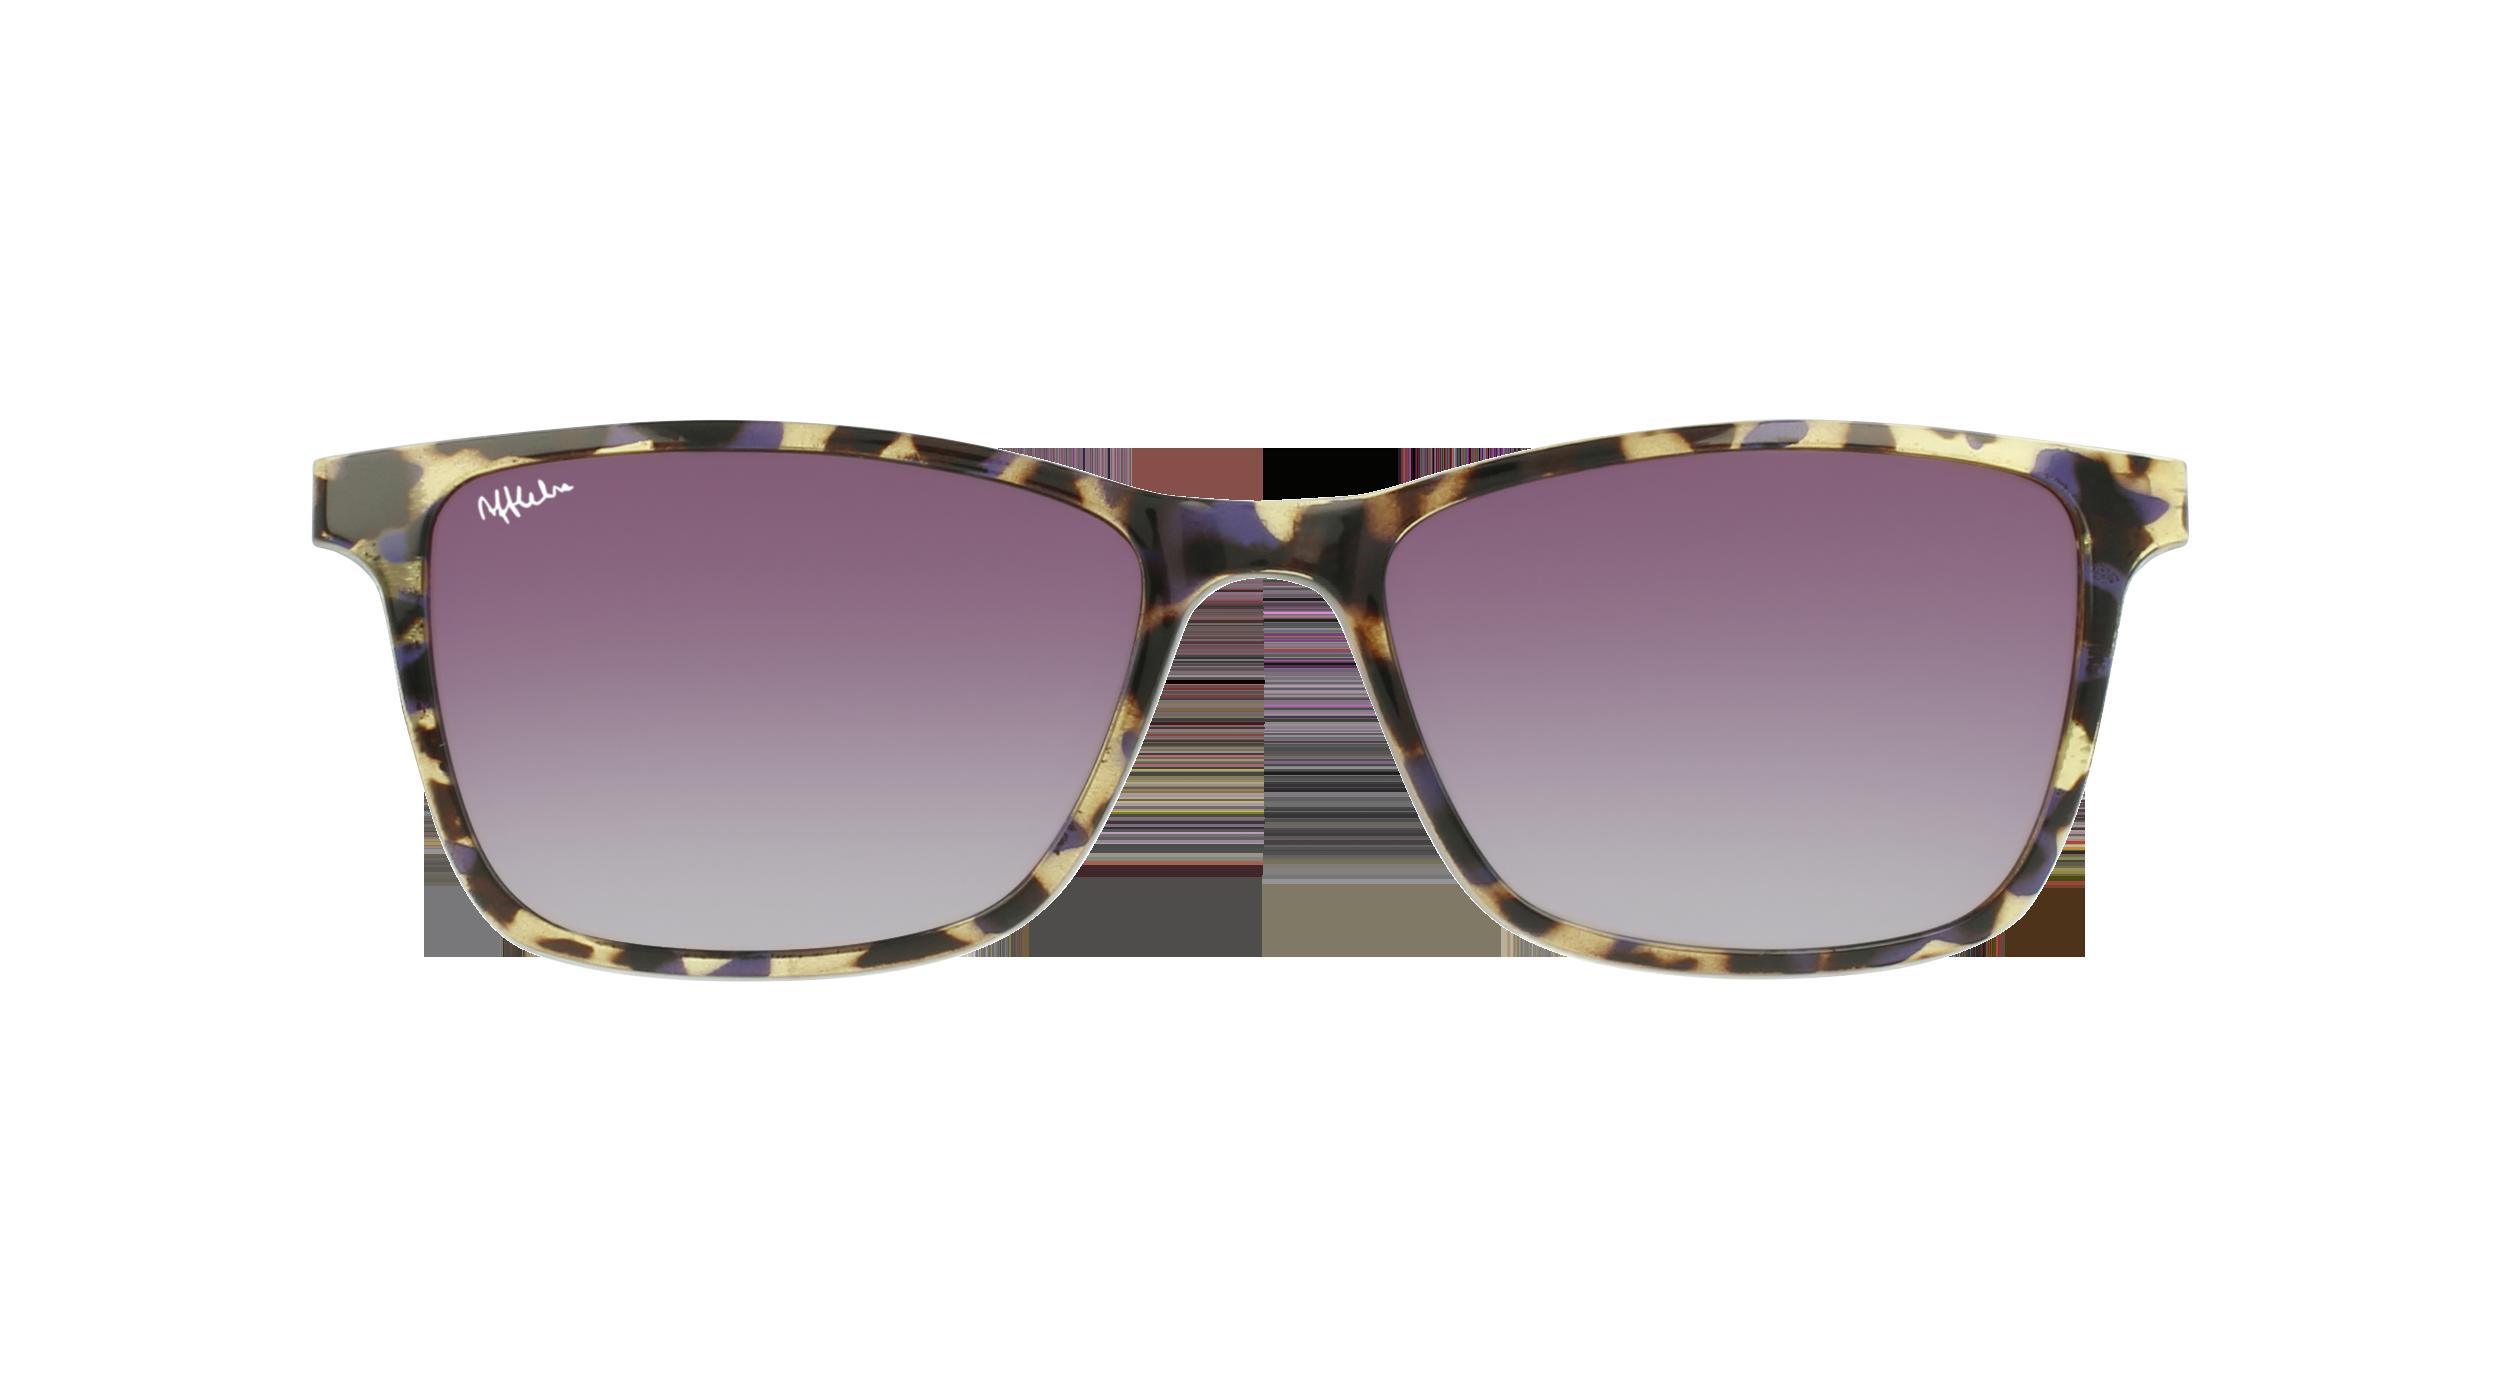 afflelou/france/products/smart_clip/clips_glasses/07630036457733.png